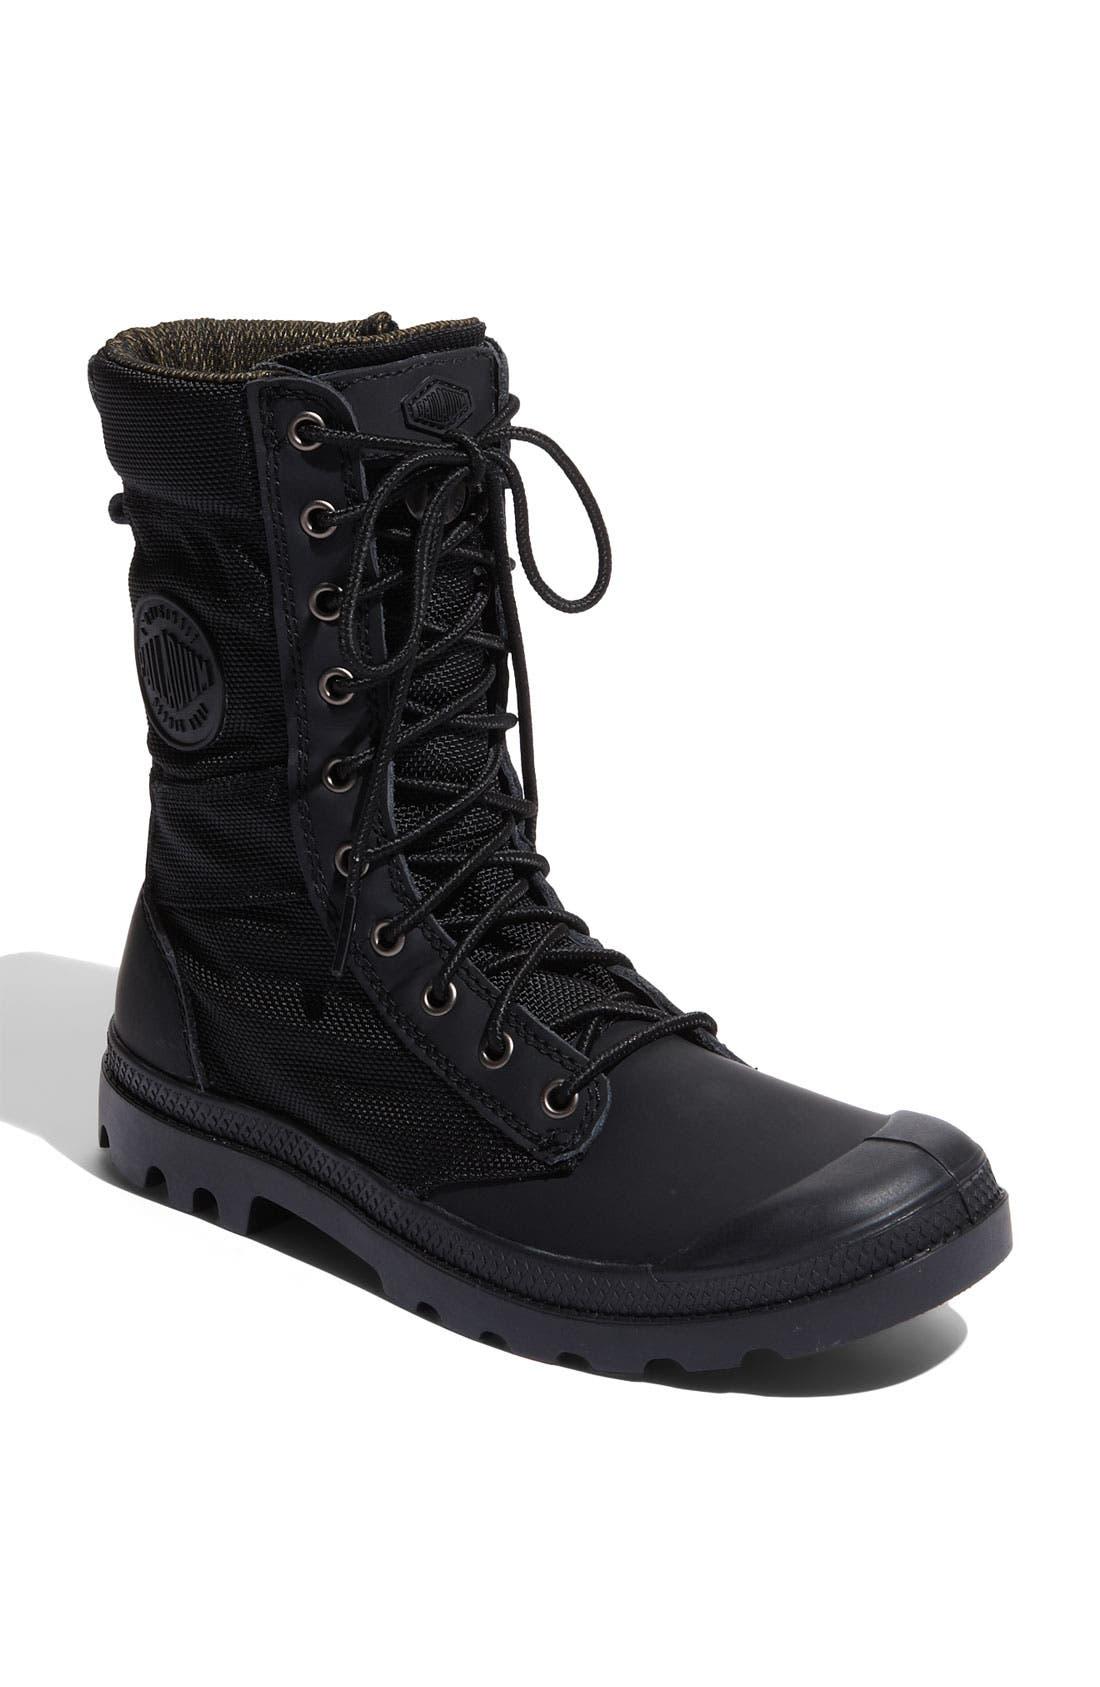 Main Image - Palladium 'Pampa' Tactical Boot